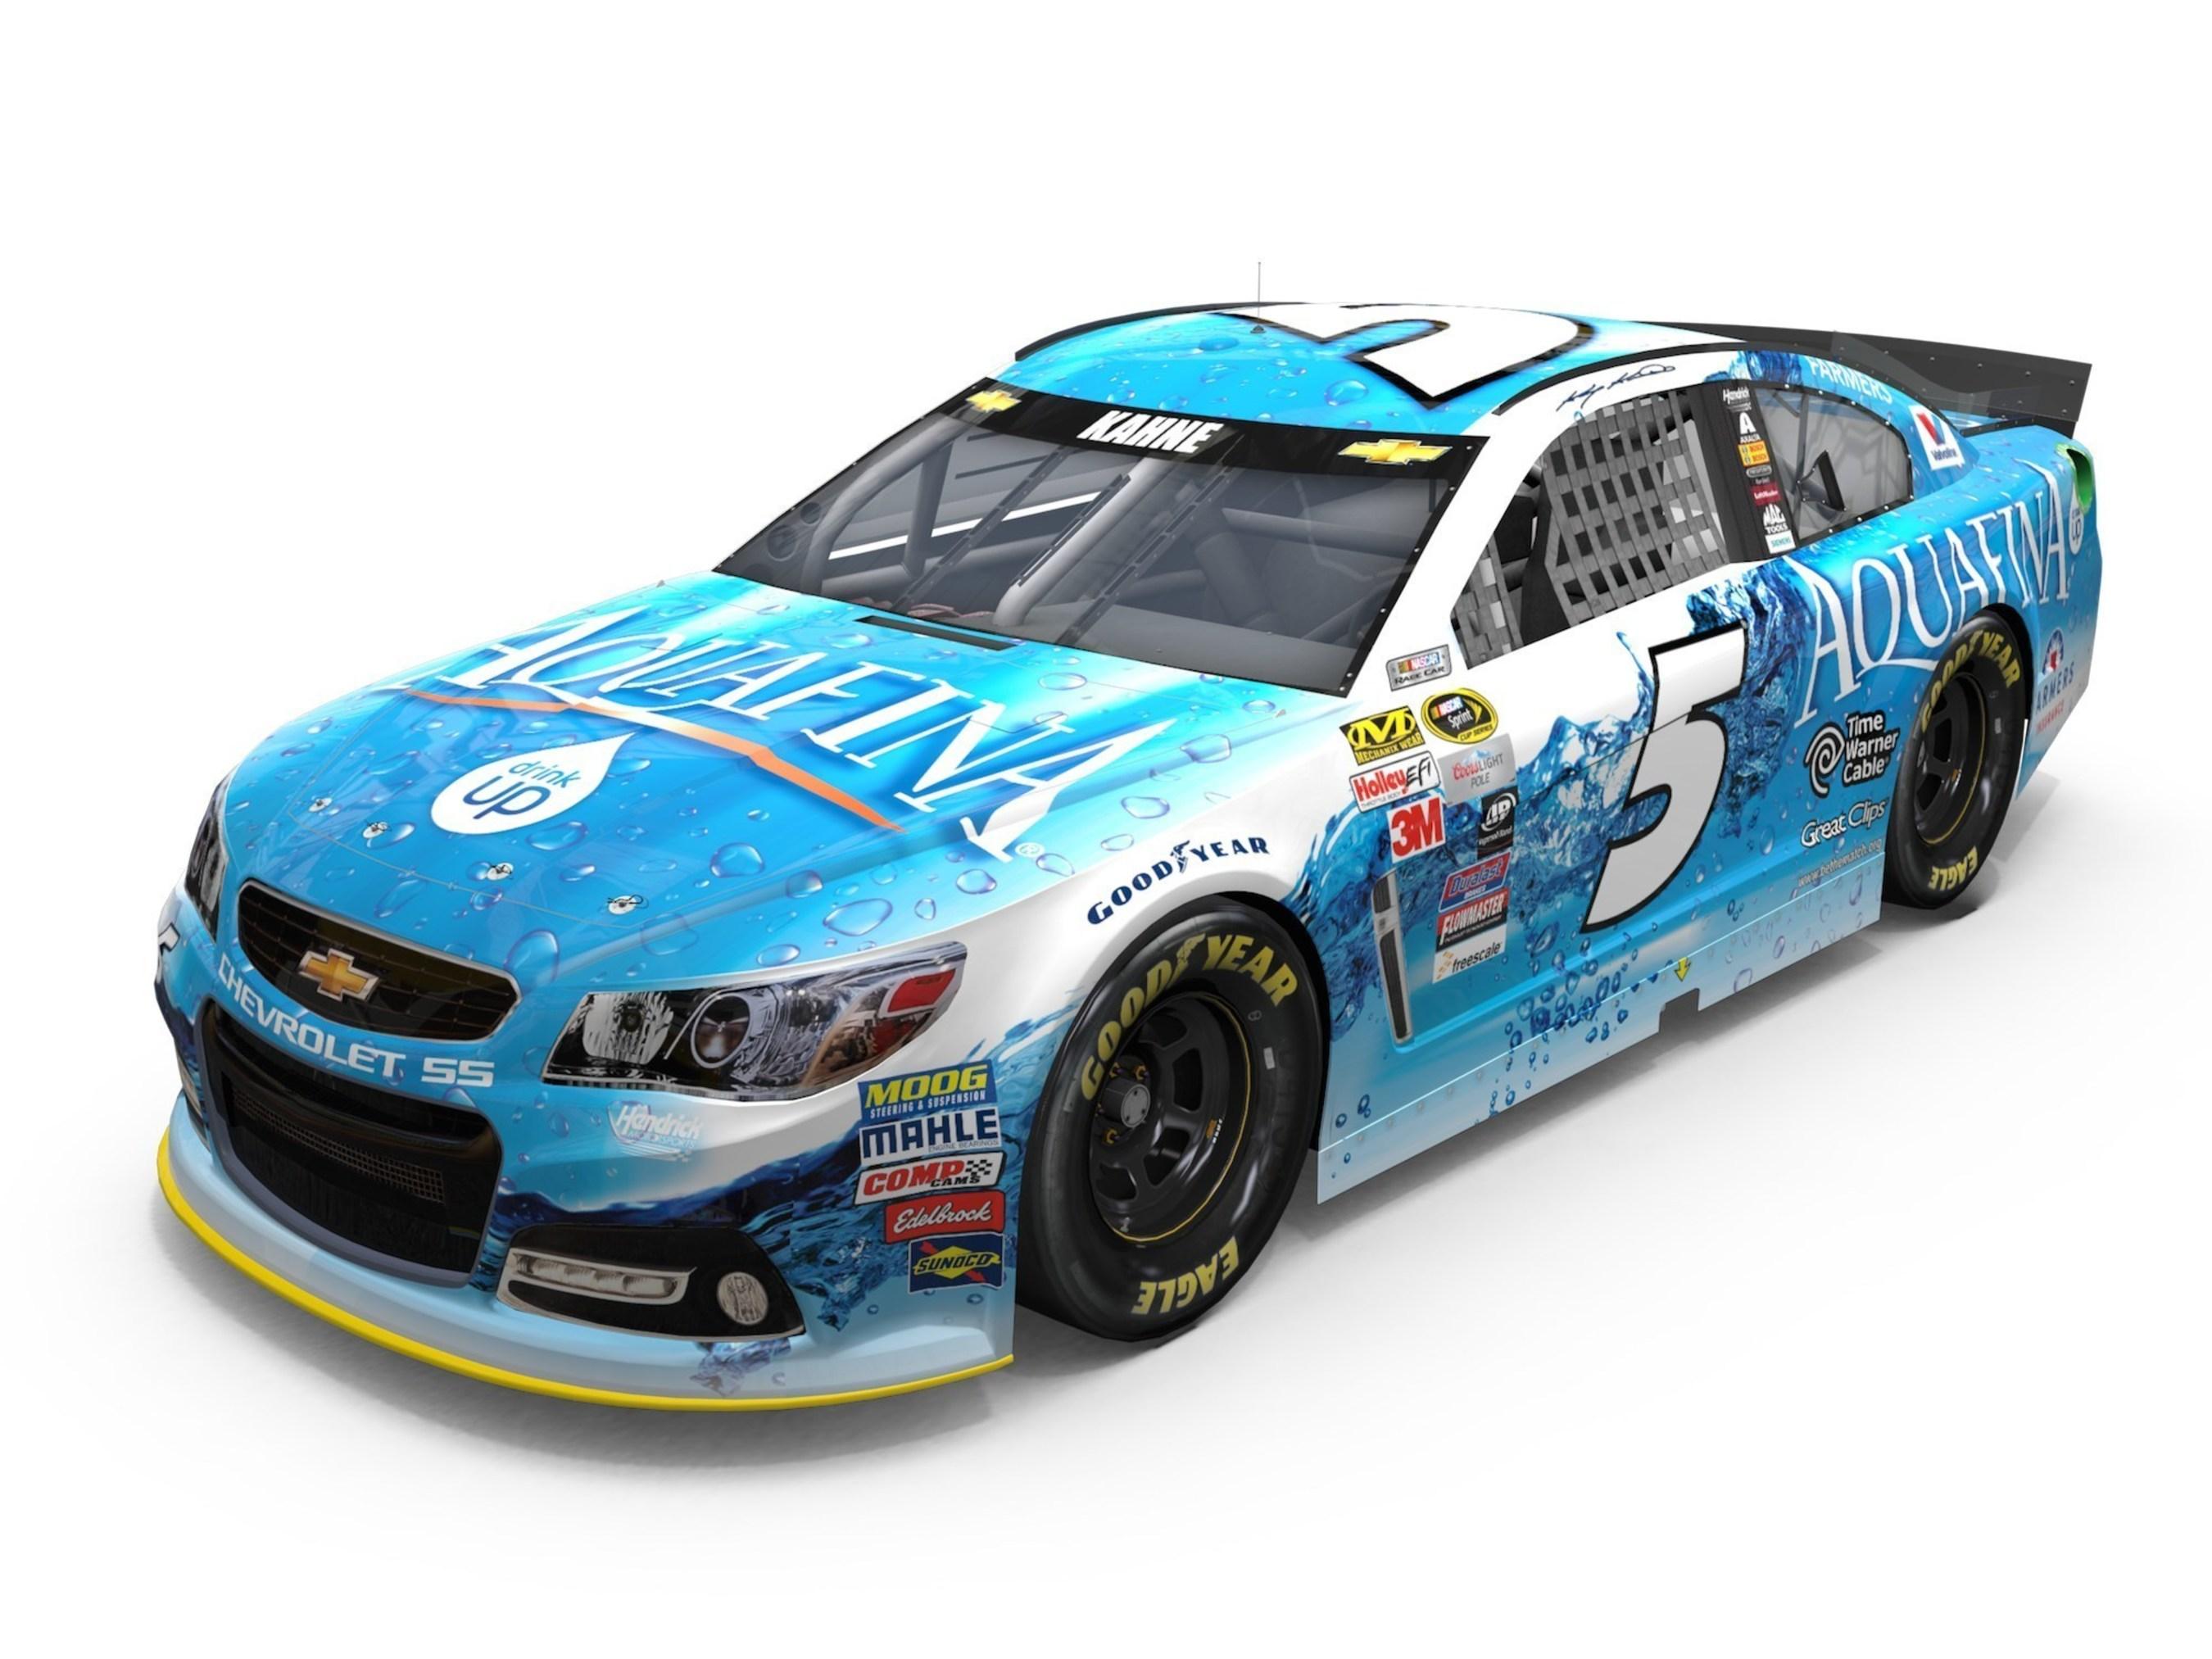 Image provided by Hendrick Motorsports